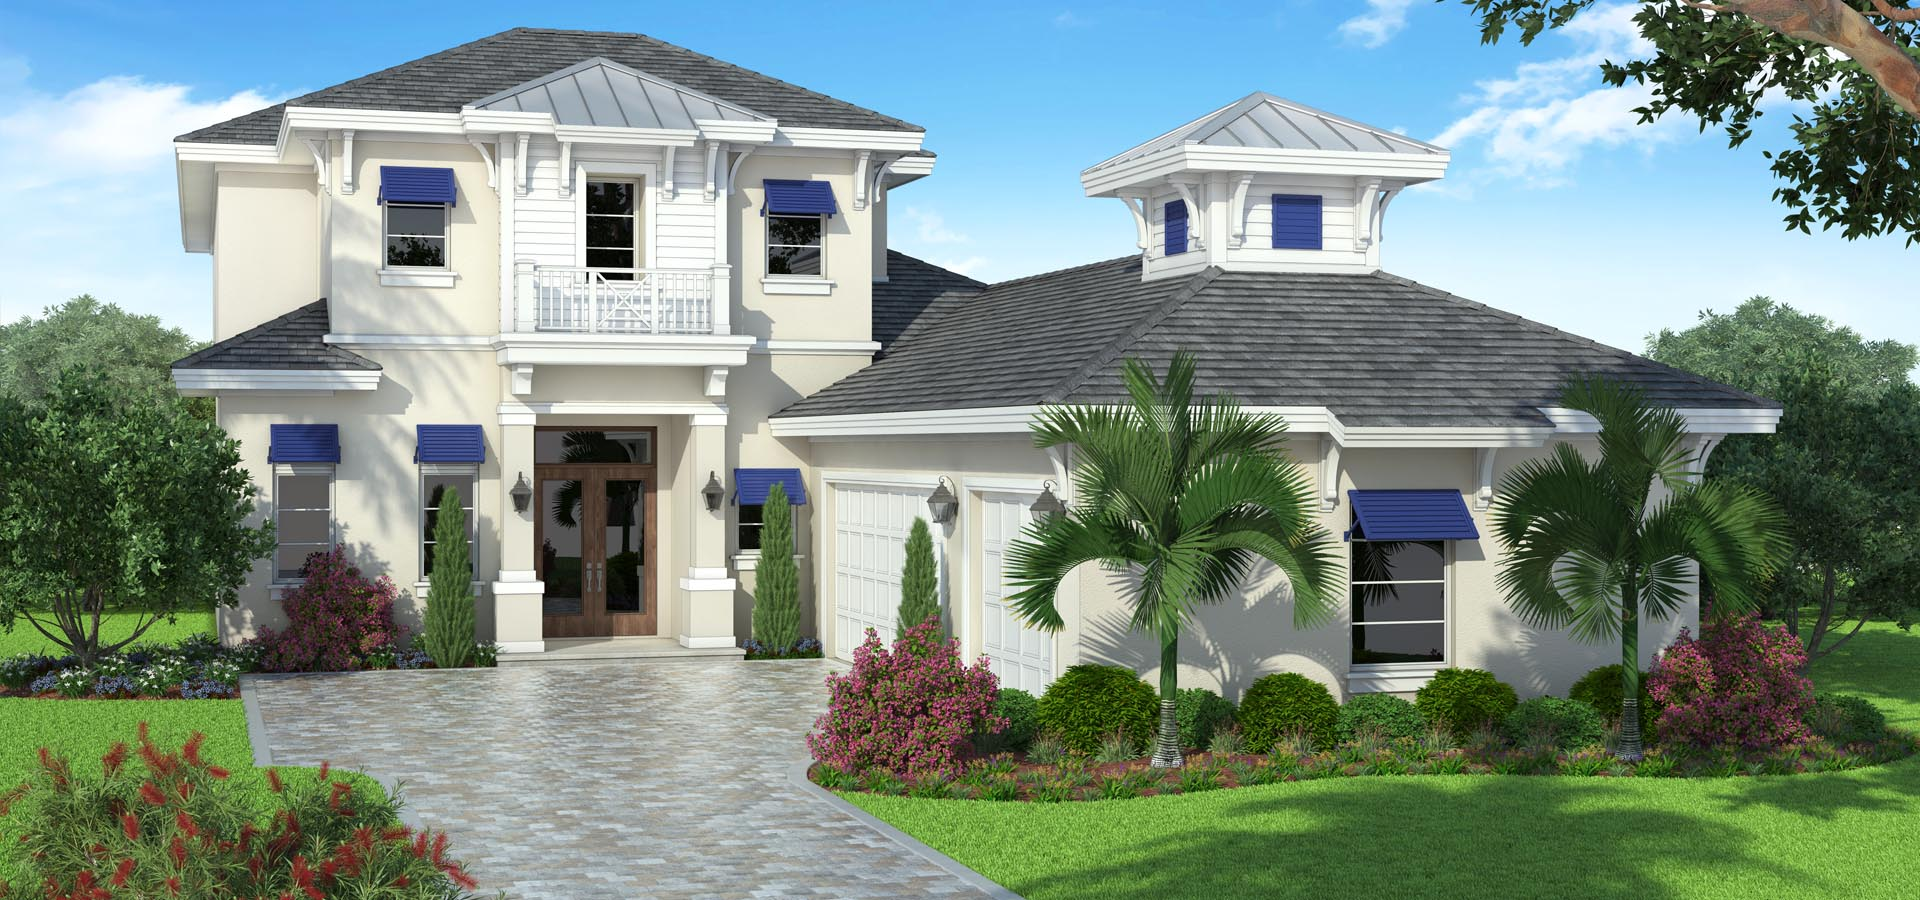 naples florida beach home for sale - photo#19